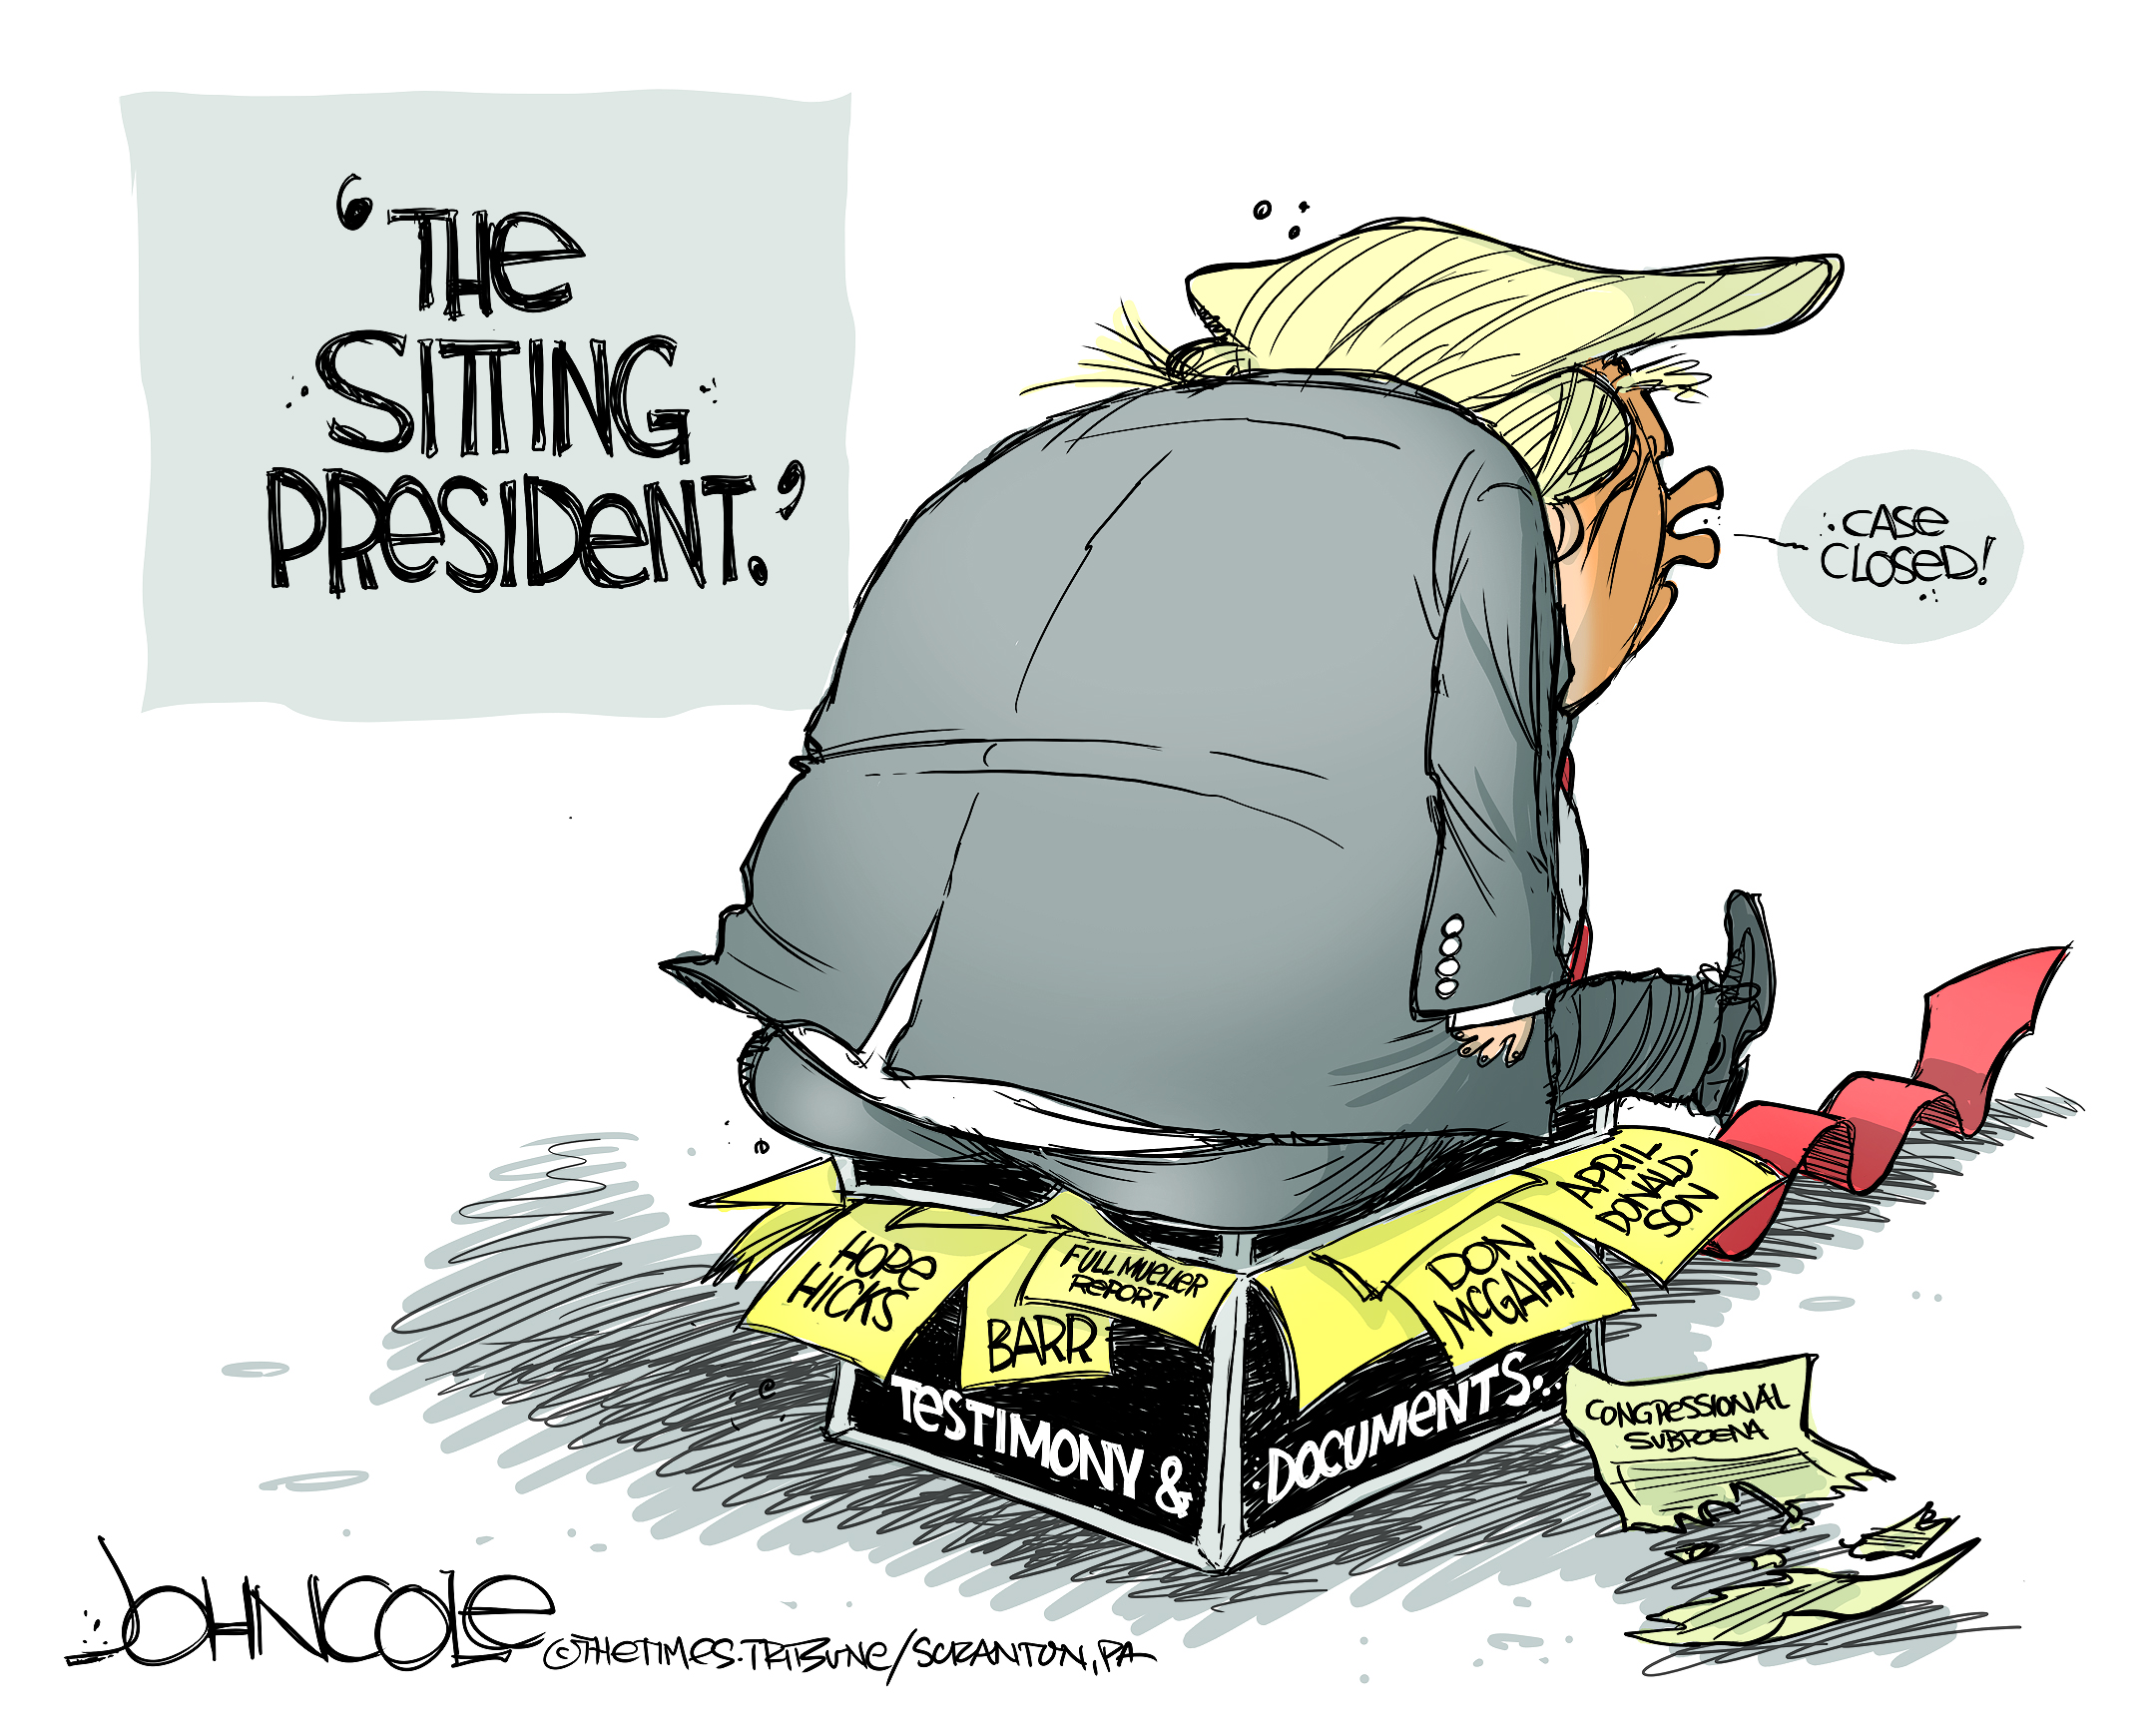 The Sitting President  (John Cole , The Scranton Times-Tribune, PA)